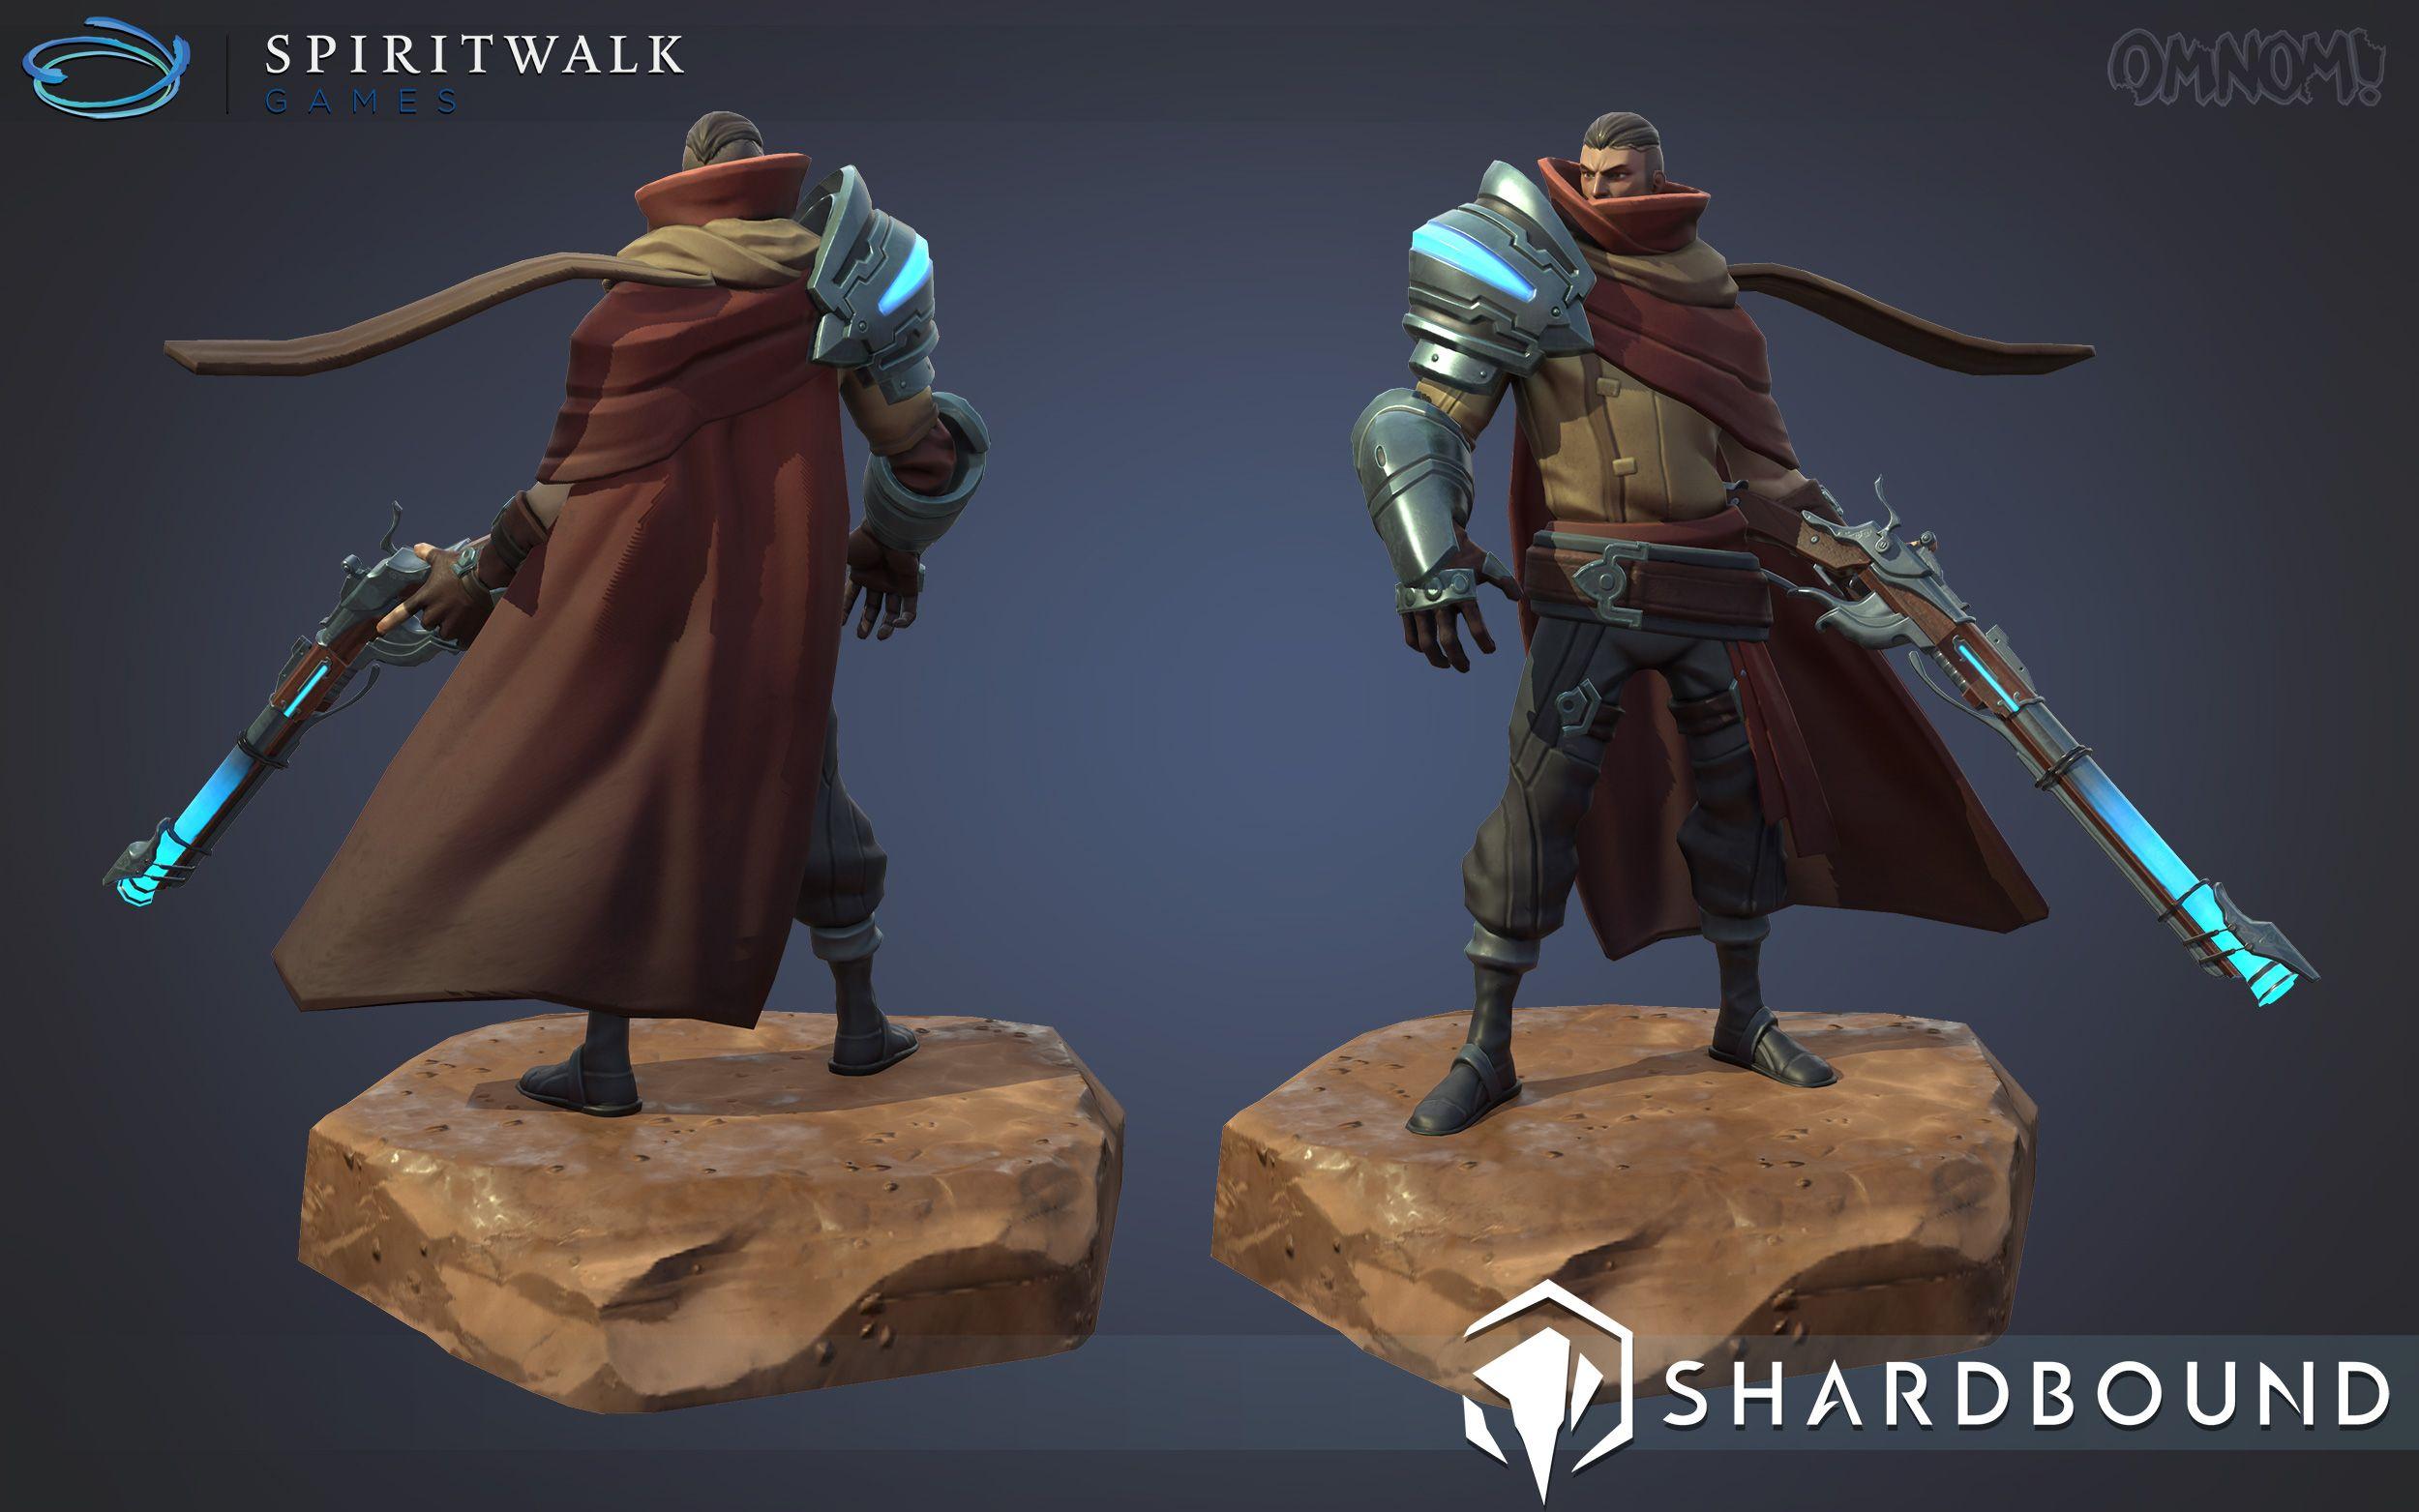 Game Character Design Tips : Image: http: www.omnomworkshop.com portfolio sb deadeye pose01.jpg